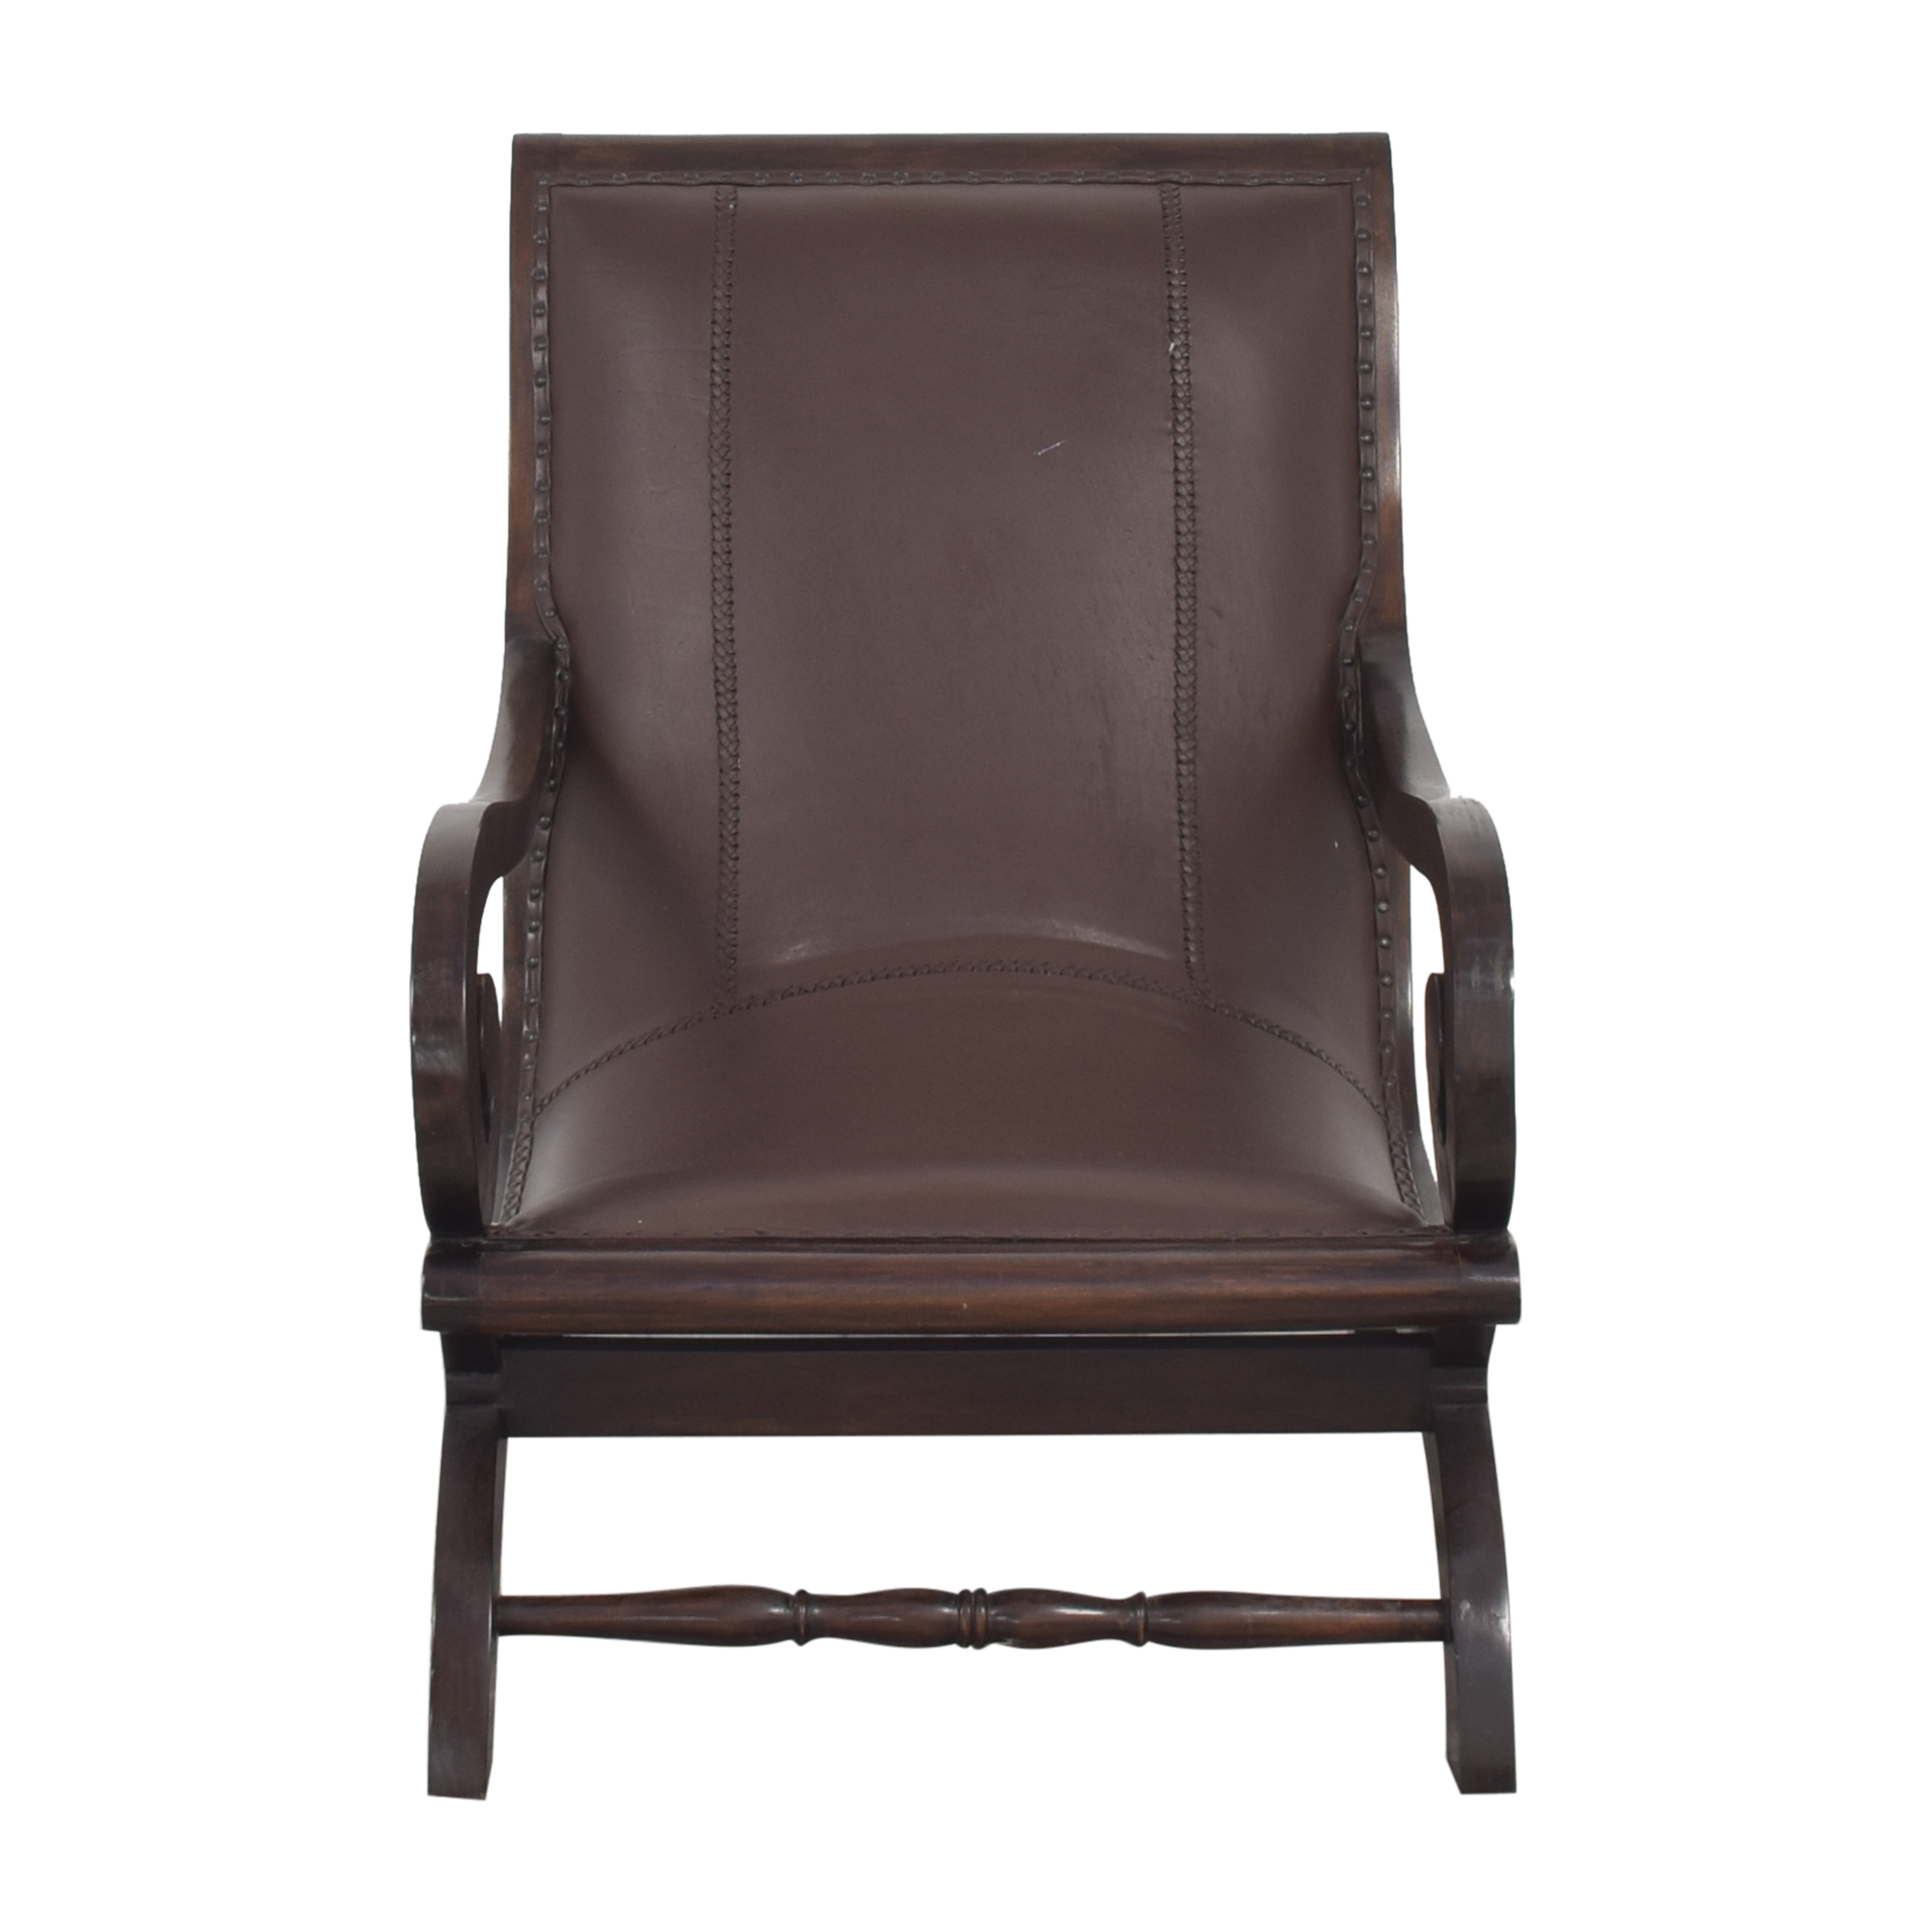 Grandin Road Grandin Road Accent Chair